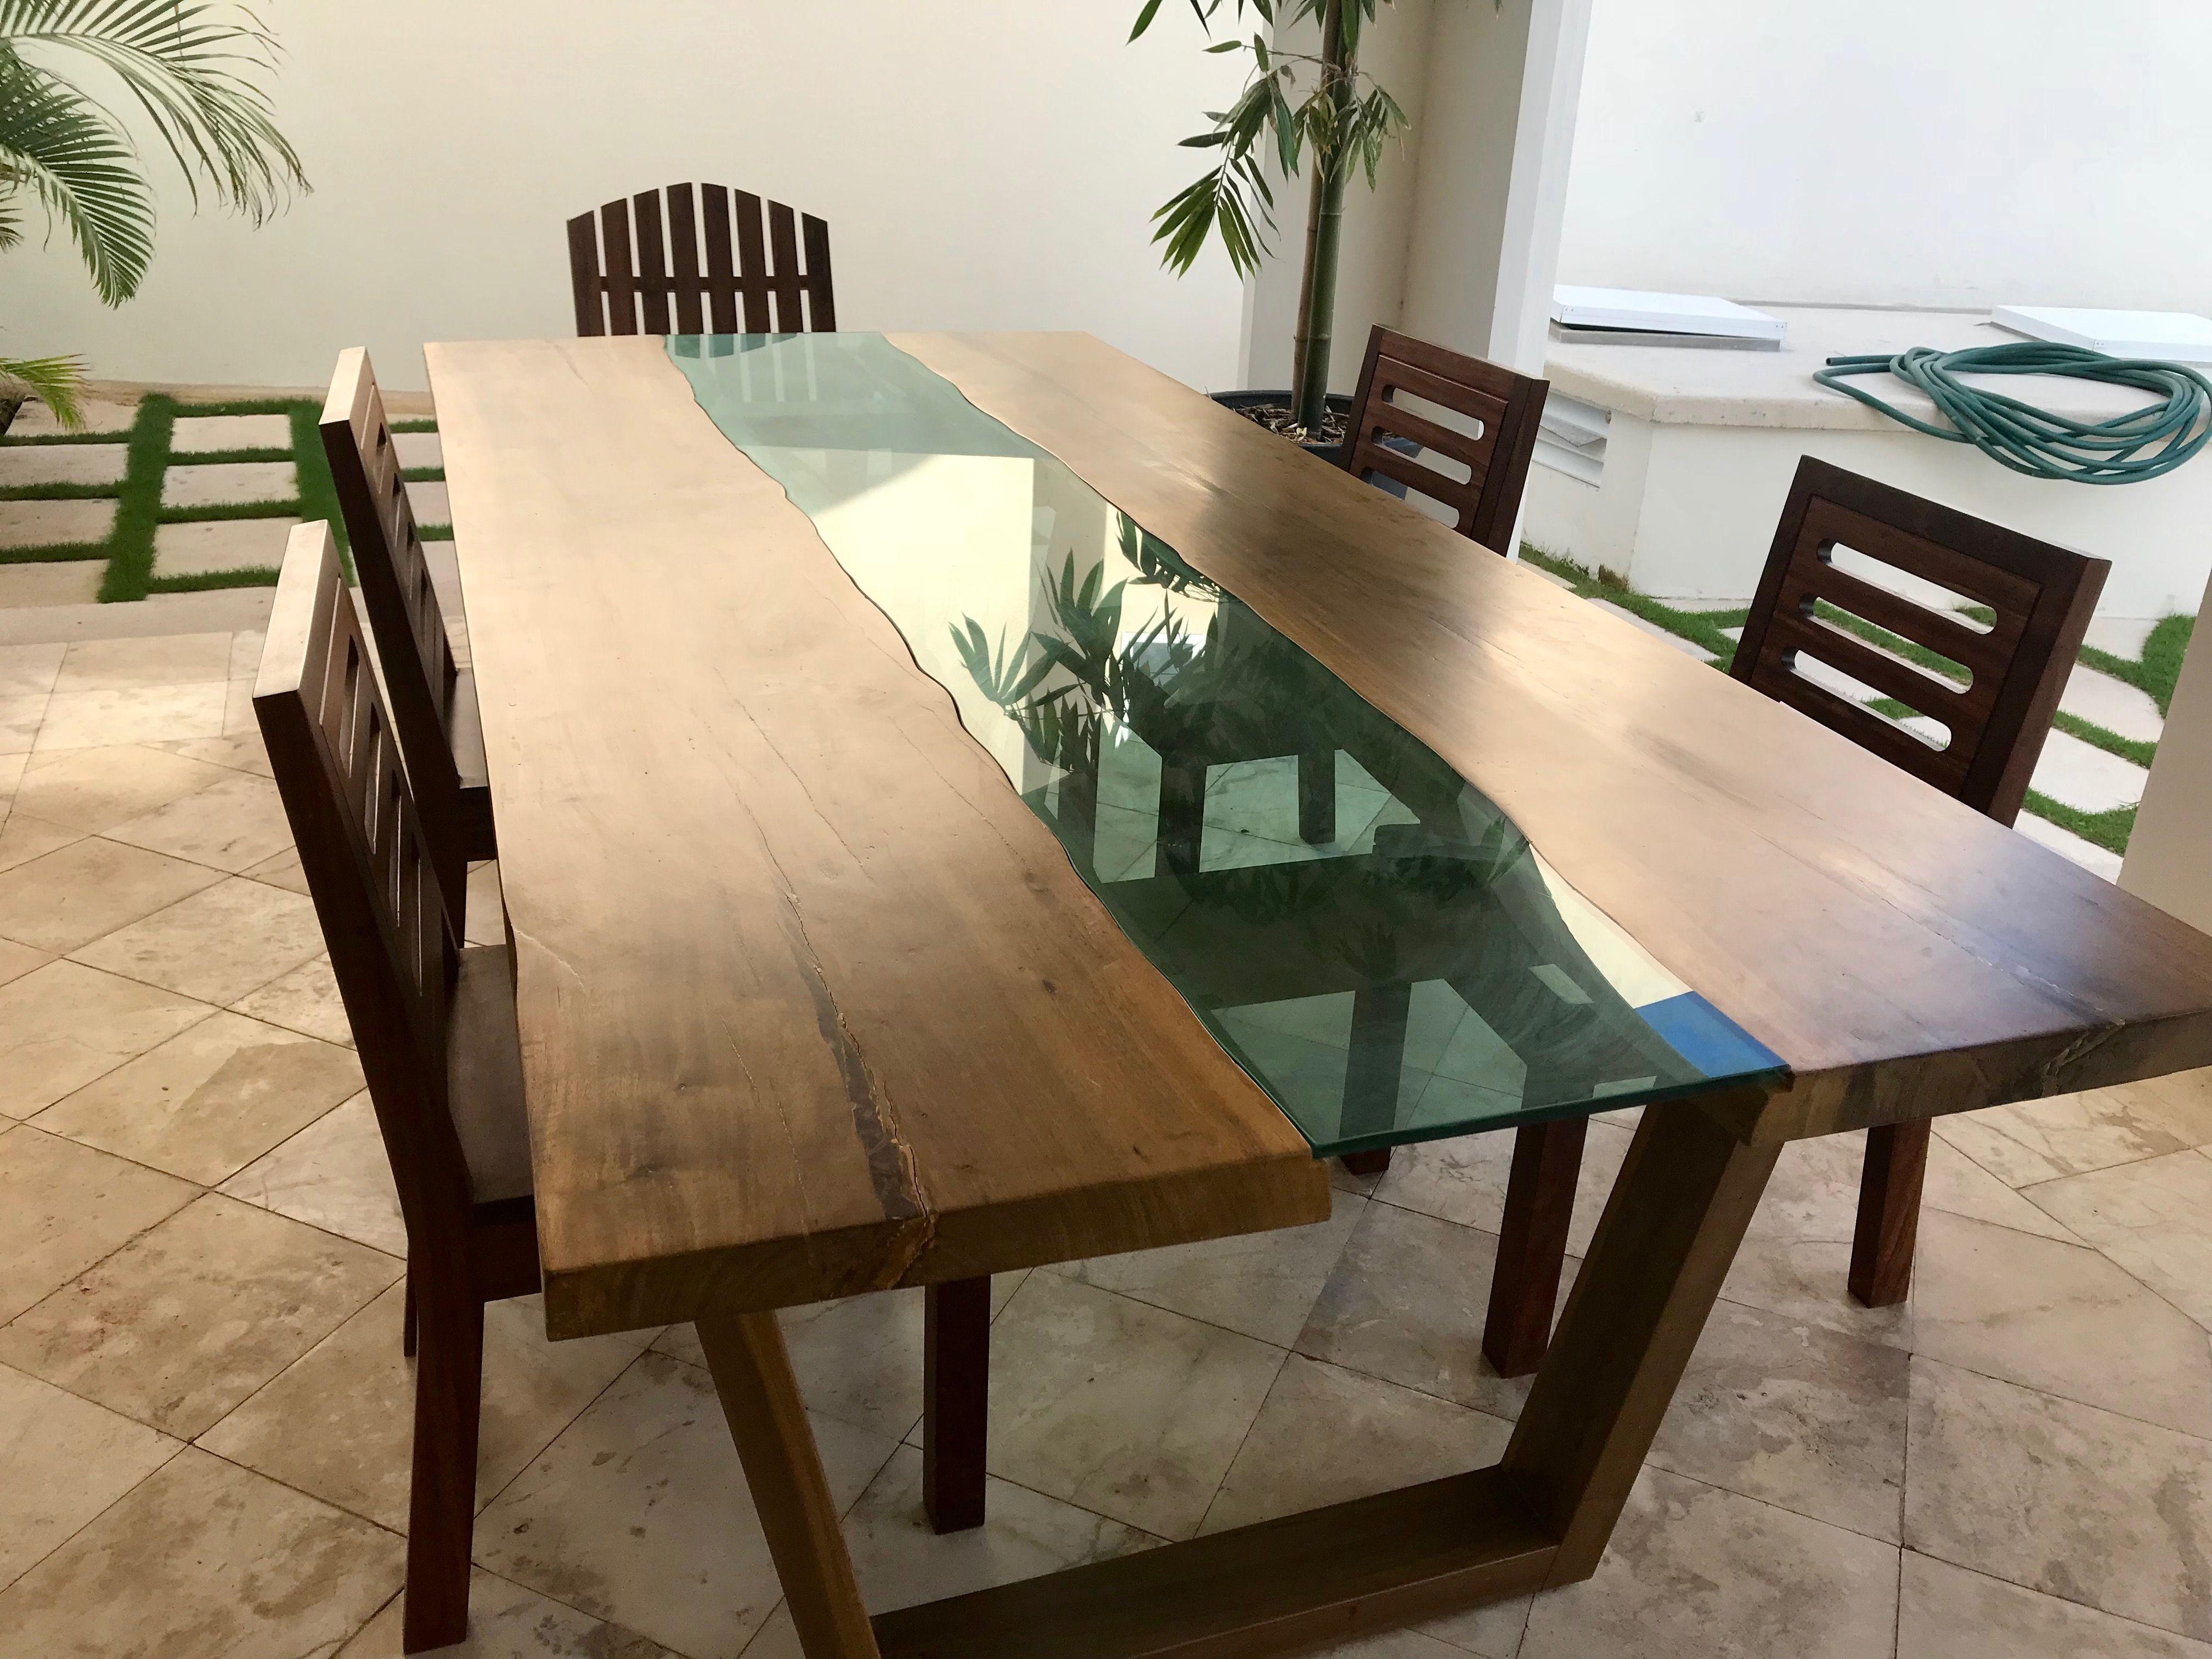 Diy Metal Furniture Wood Furniture, Furniture Design, Modern Dinner Table,